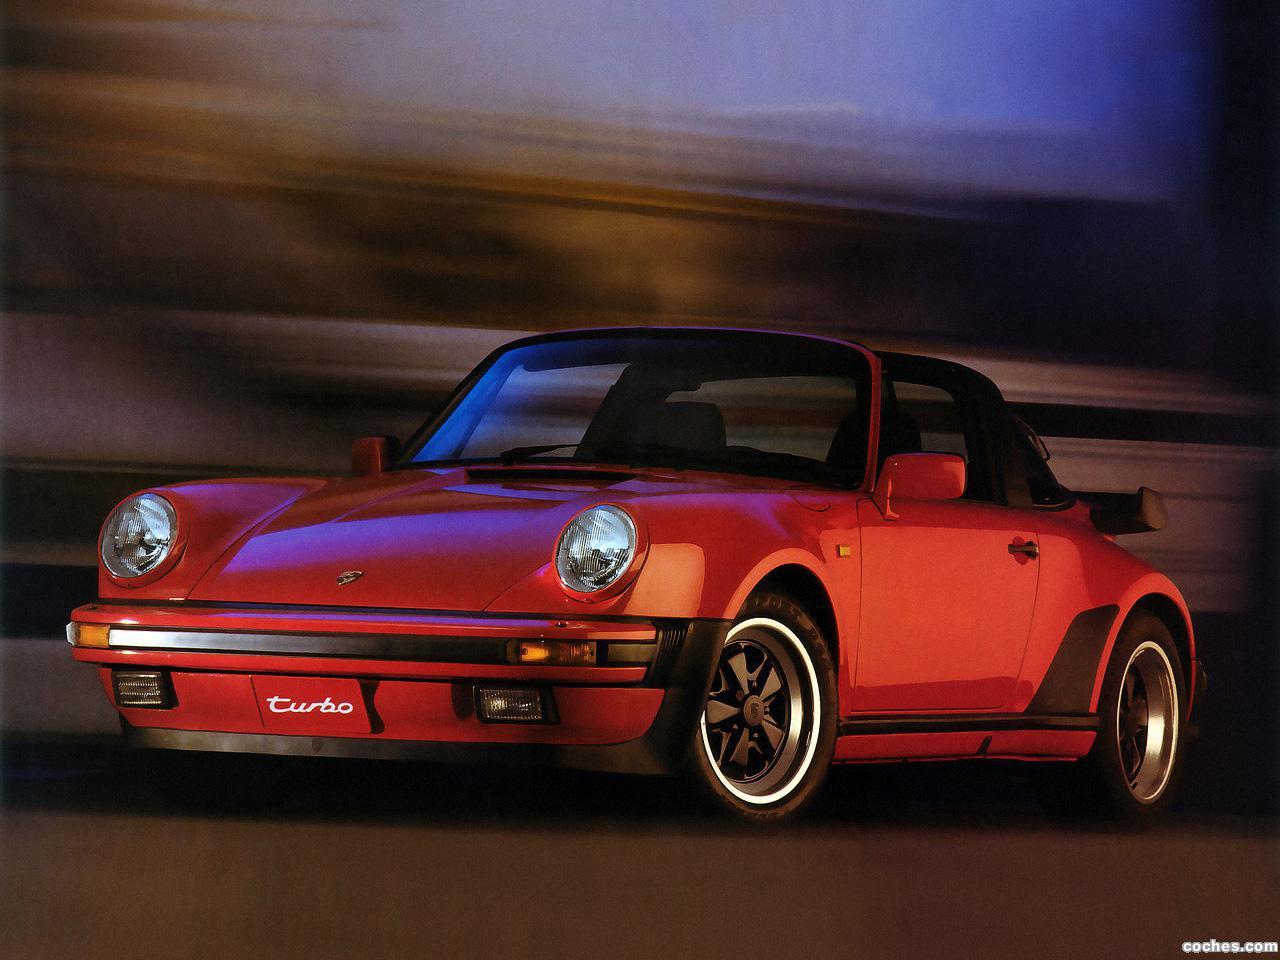 fotos de porsche 911 turbo targa 930 1987. Black Bedroom Furniture Sets. Home Design Ideas